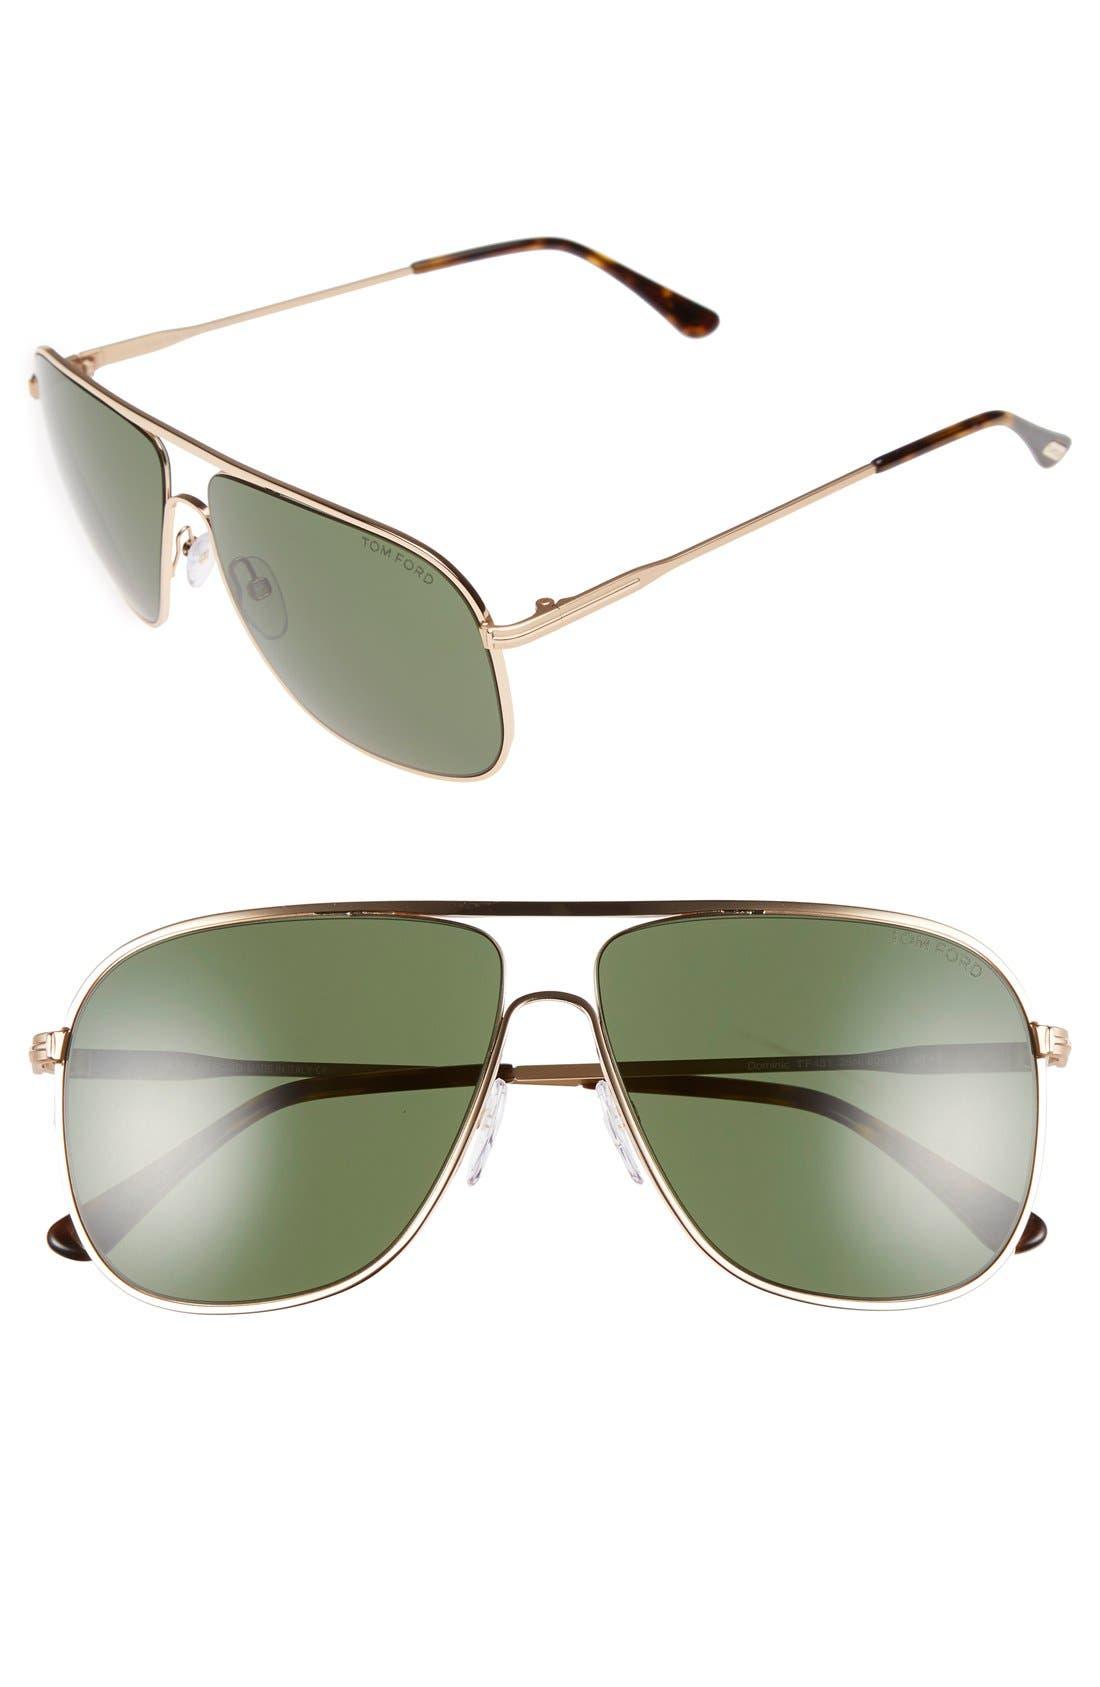 60mm Aviator Sunglasses,                             Main thumbnail 1, color,                             SRGLD/GRN